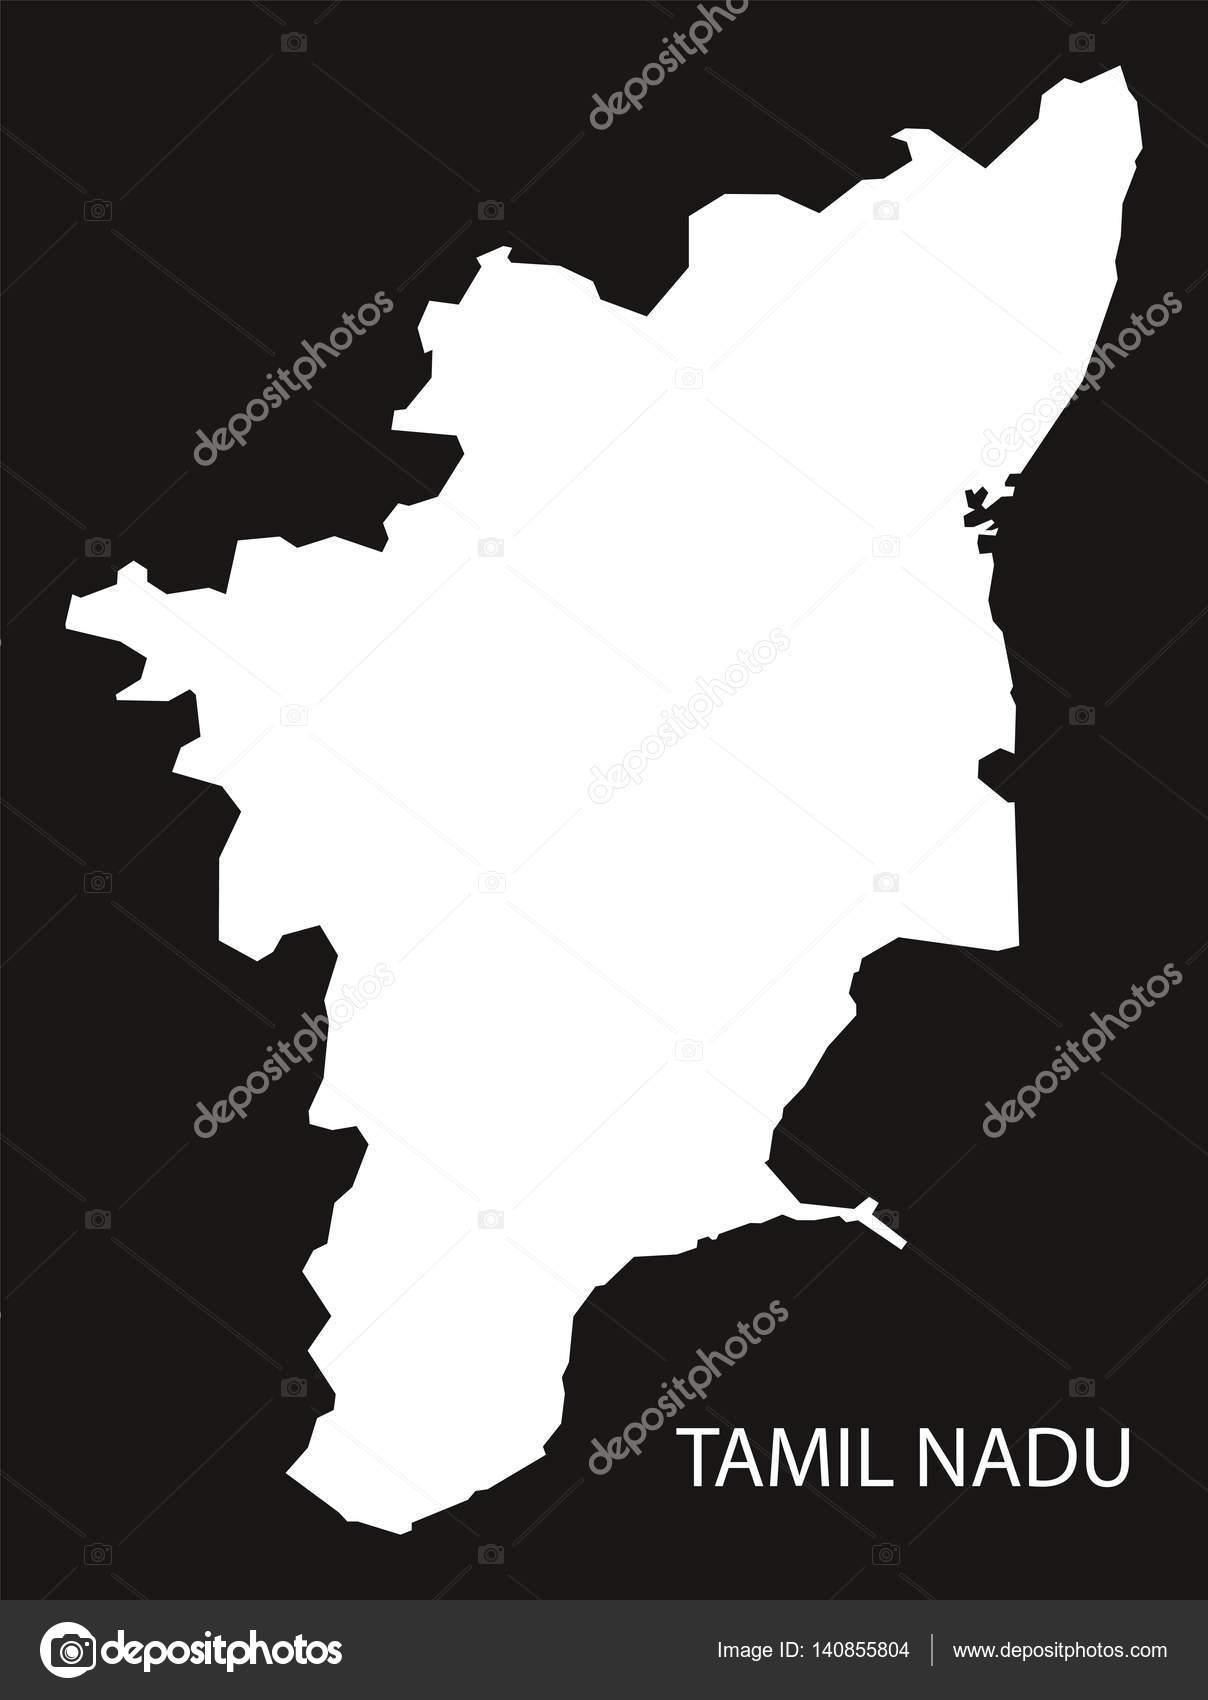 Negro de tamil nadu india mapa invertido vector de stock negro de tamil nadu india mapa invertido vector de stock gumiabroncs Images